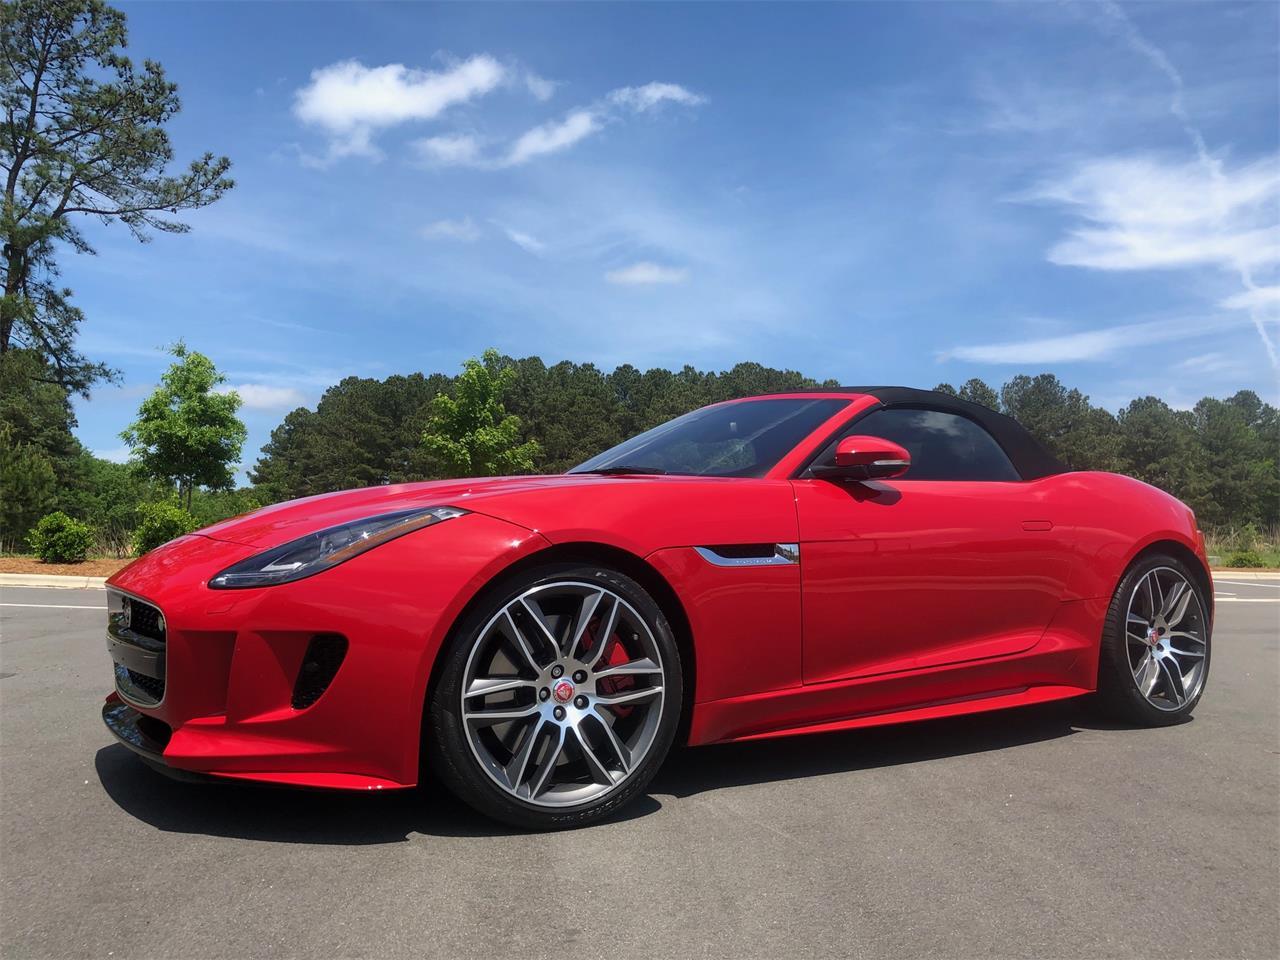 2017 Jaguar F-Type for Sale | ClassicCars.com | CC-1238967